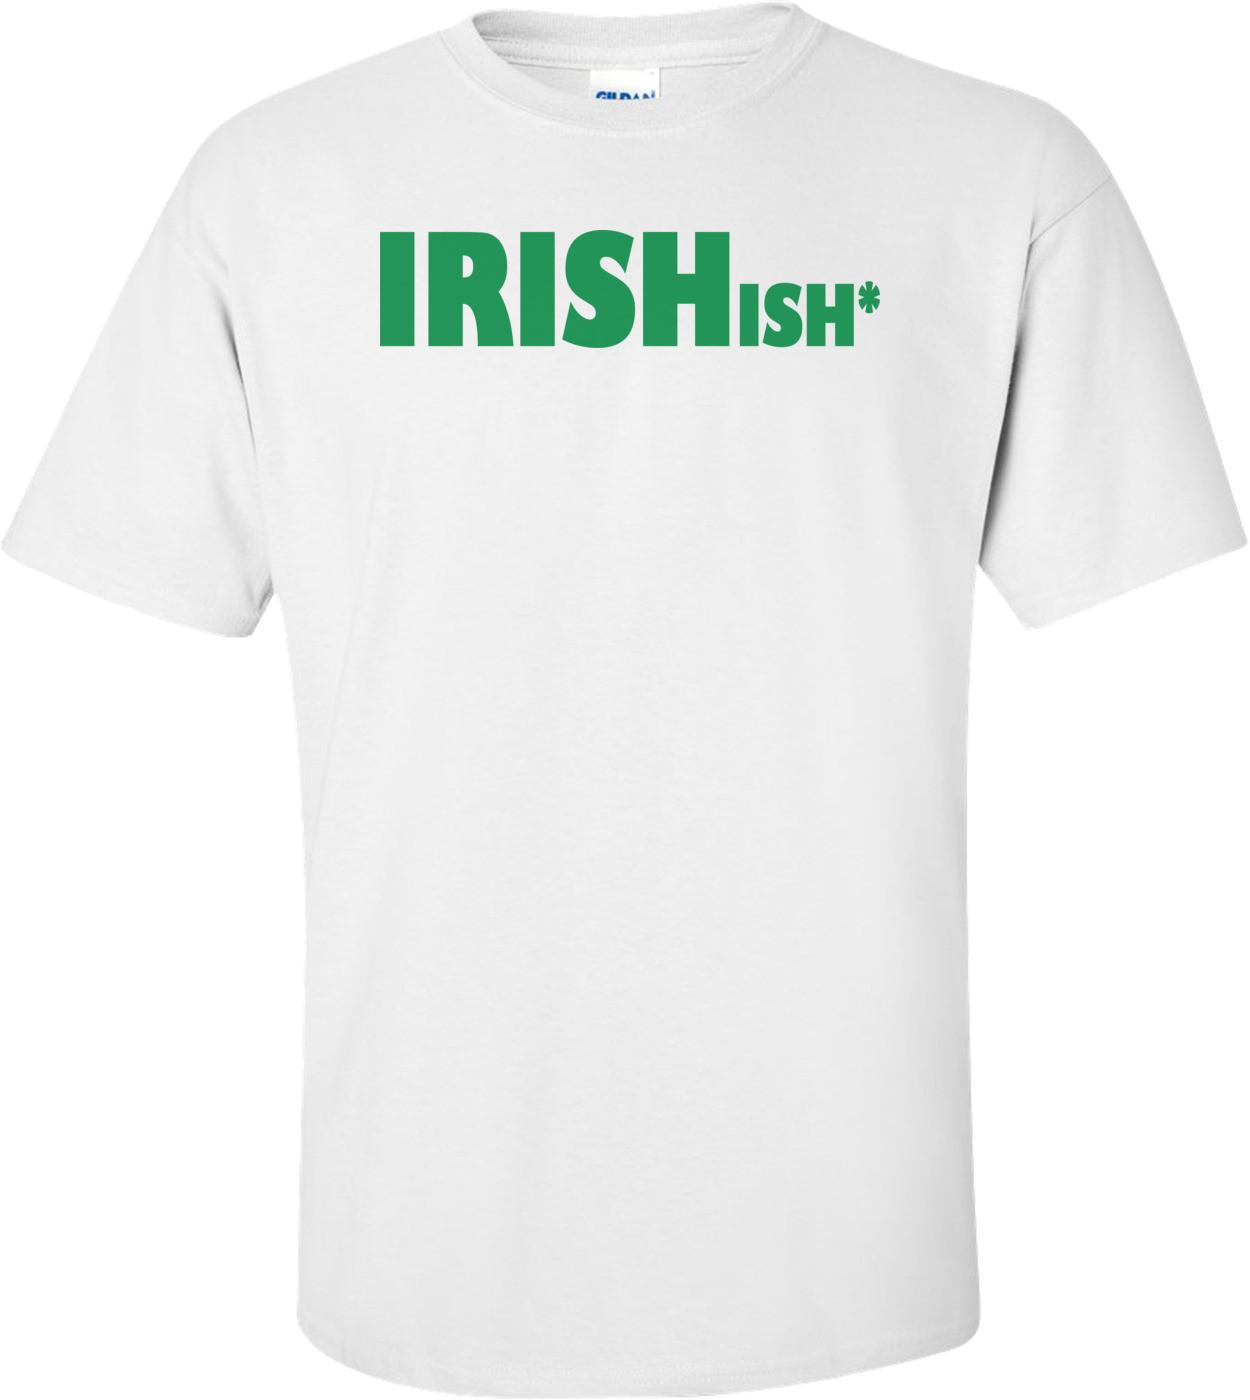 Irish-ish St. Paddy's Day Shirt